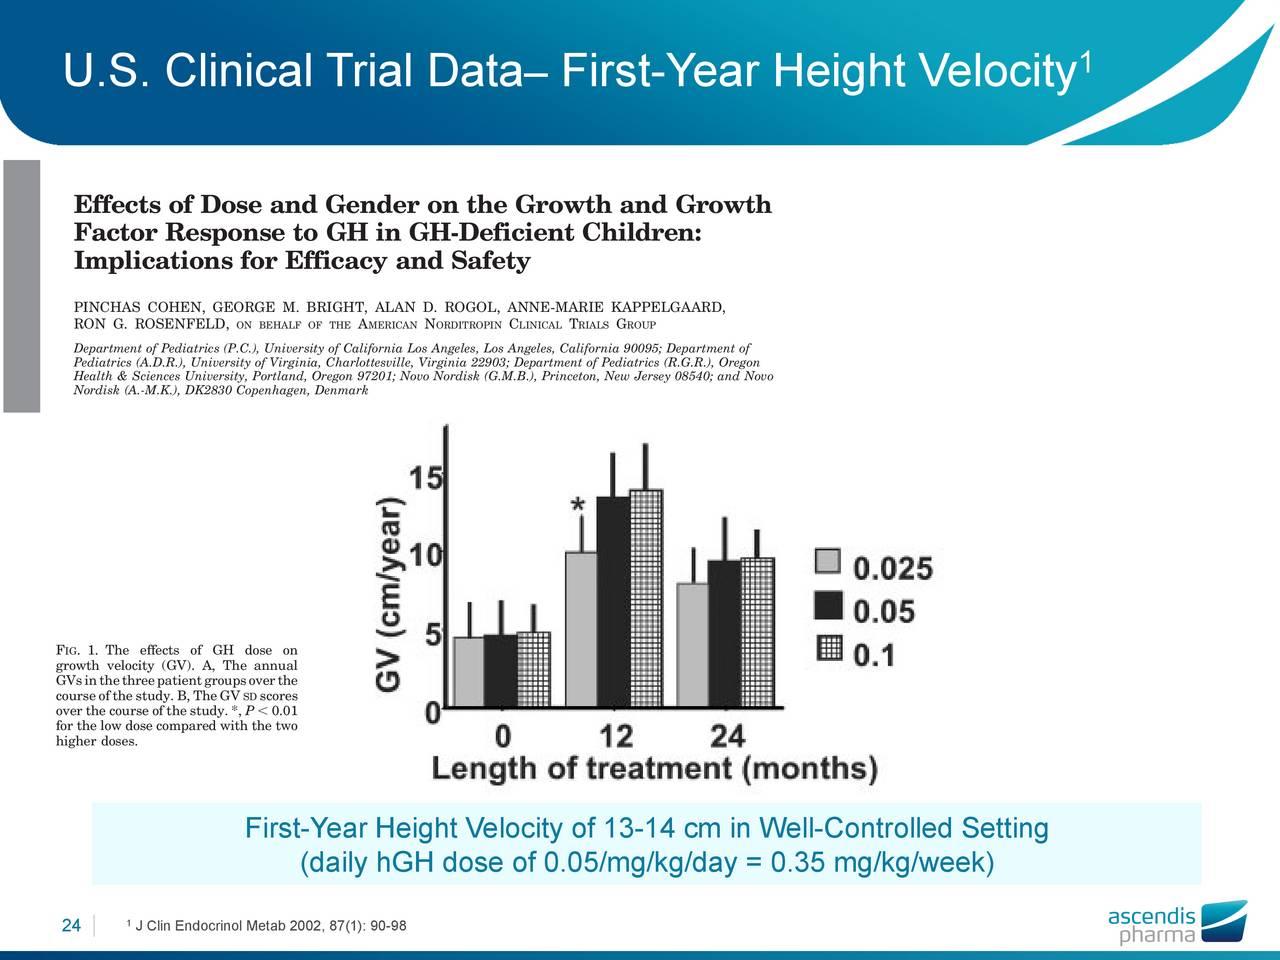 novo nordisk clinical trials